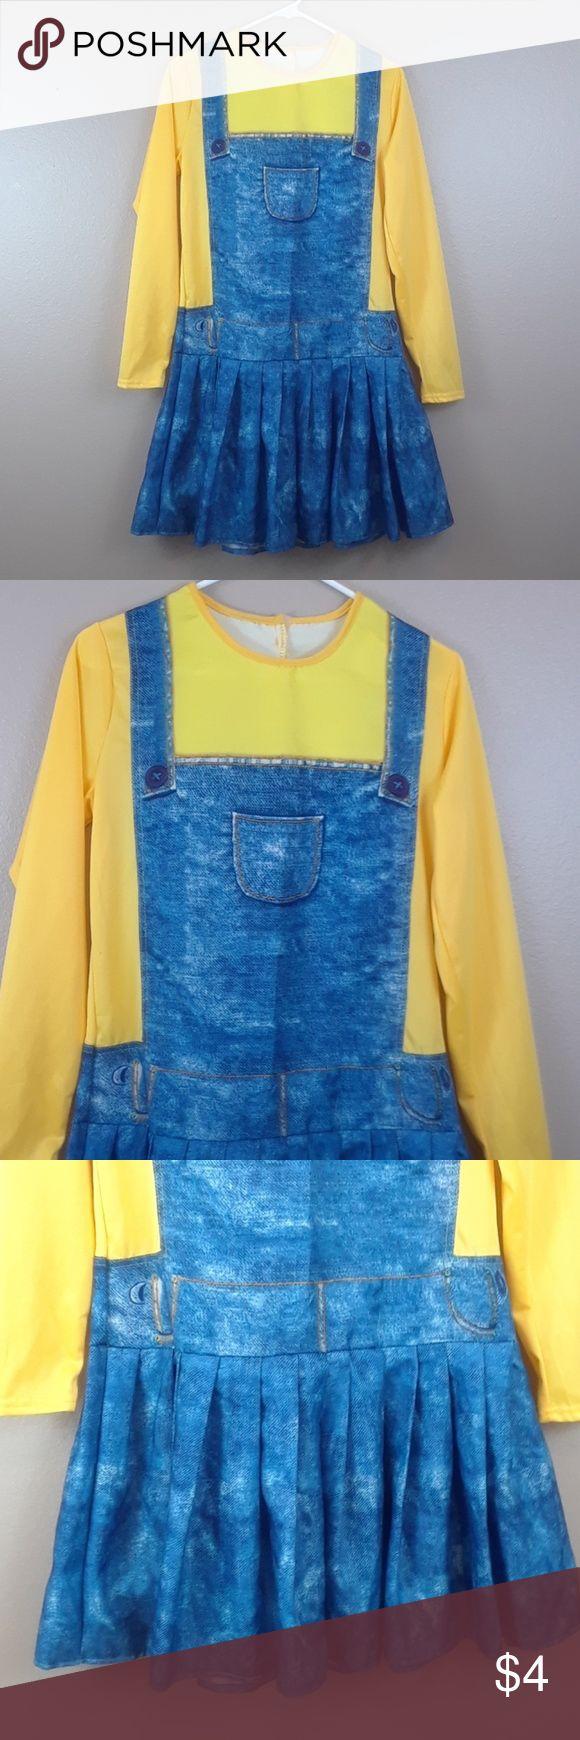 BOGO MINIONS HALLOWEEN COSTUME BOGO BUY ONE GET ONE FREE Size medium, Velcro closure in back. Illumination Dresses Midi